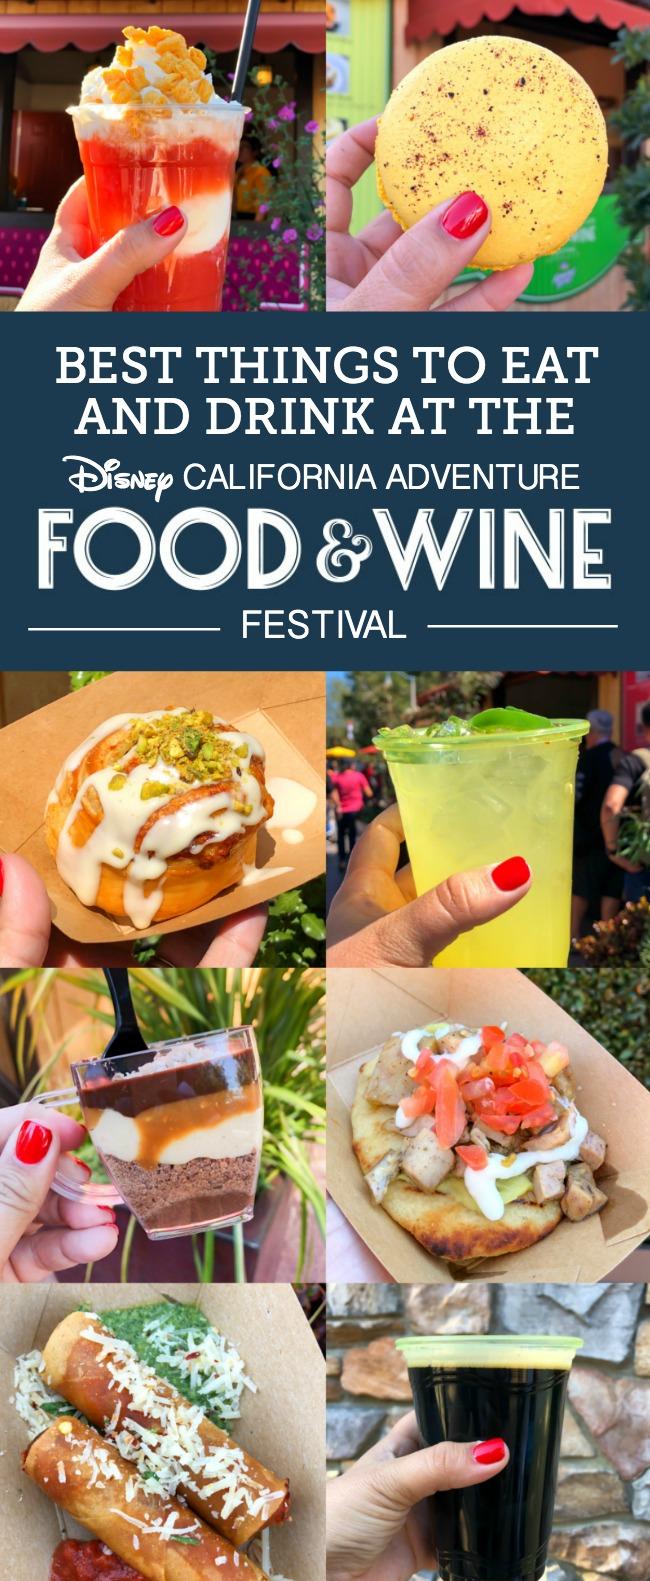 Disney California Adventure Food and Wine Festival in 2020